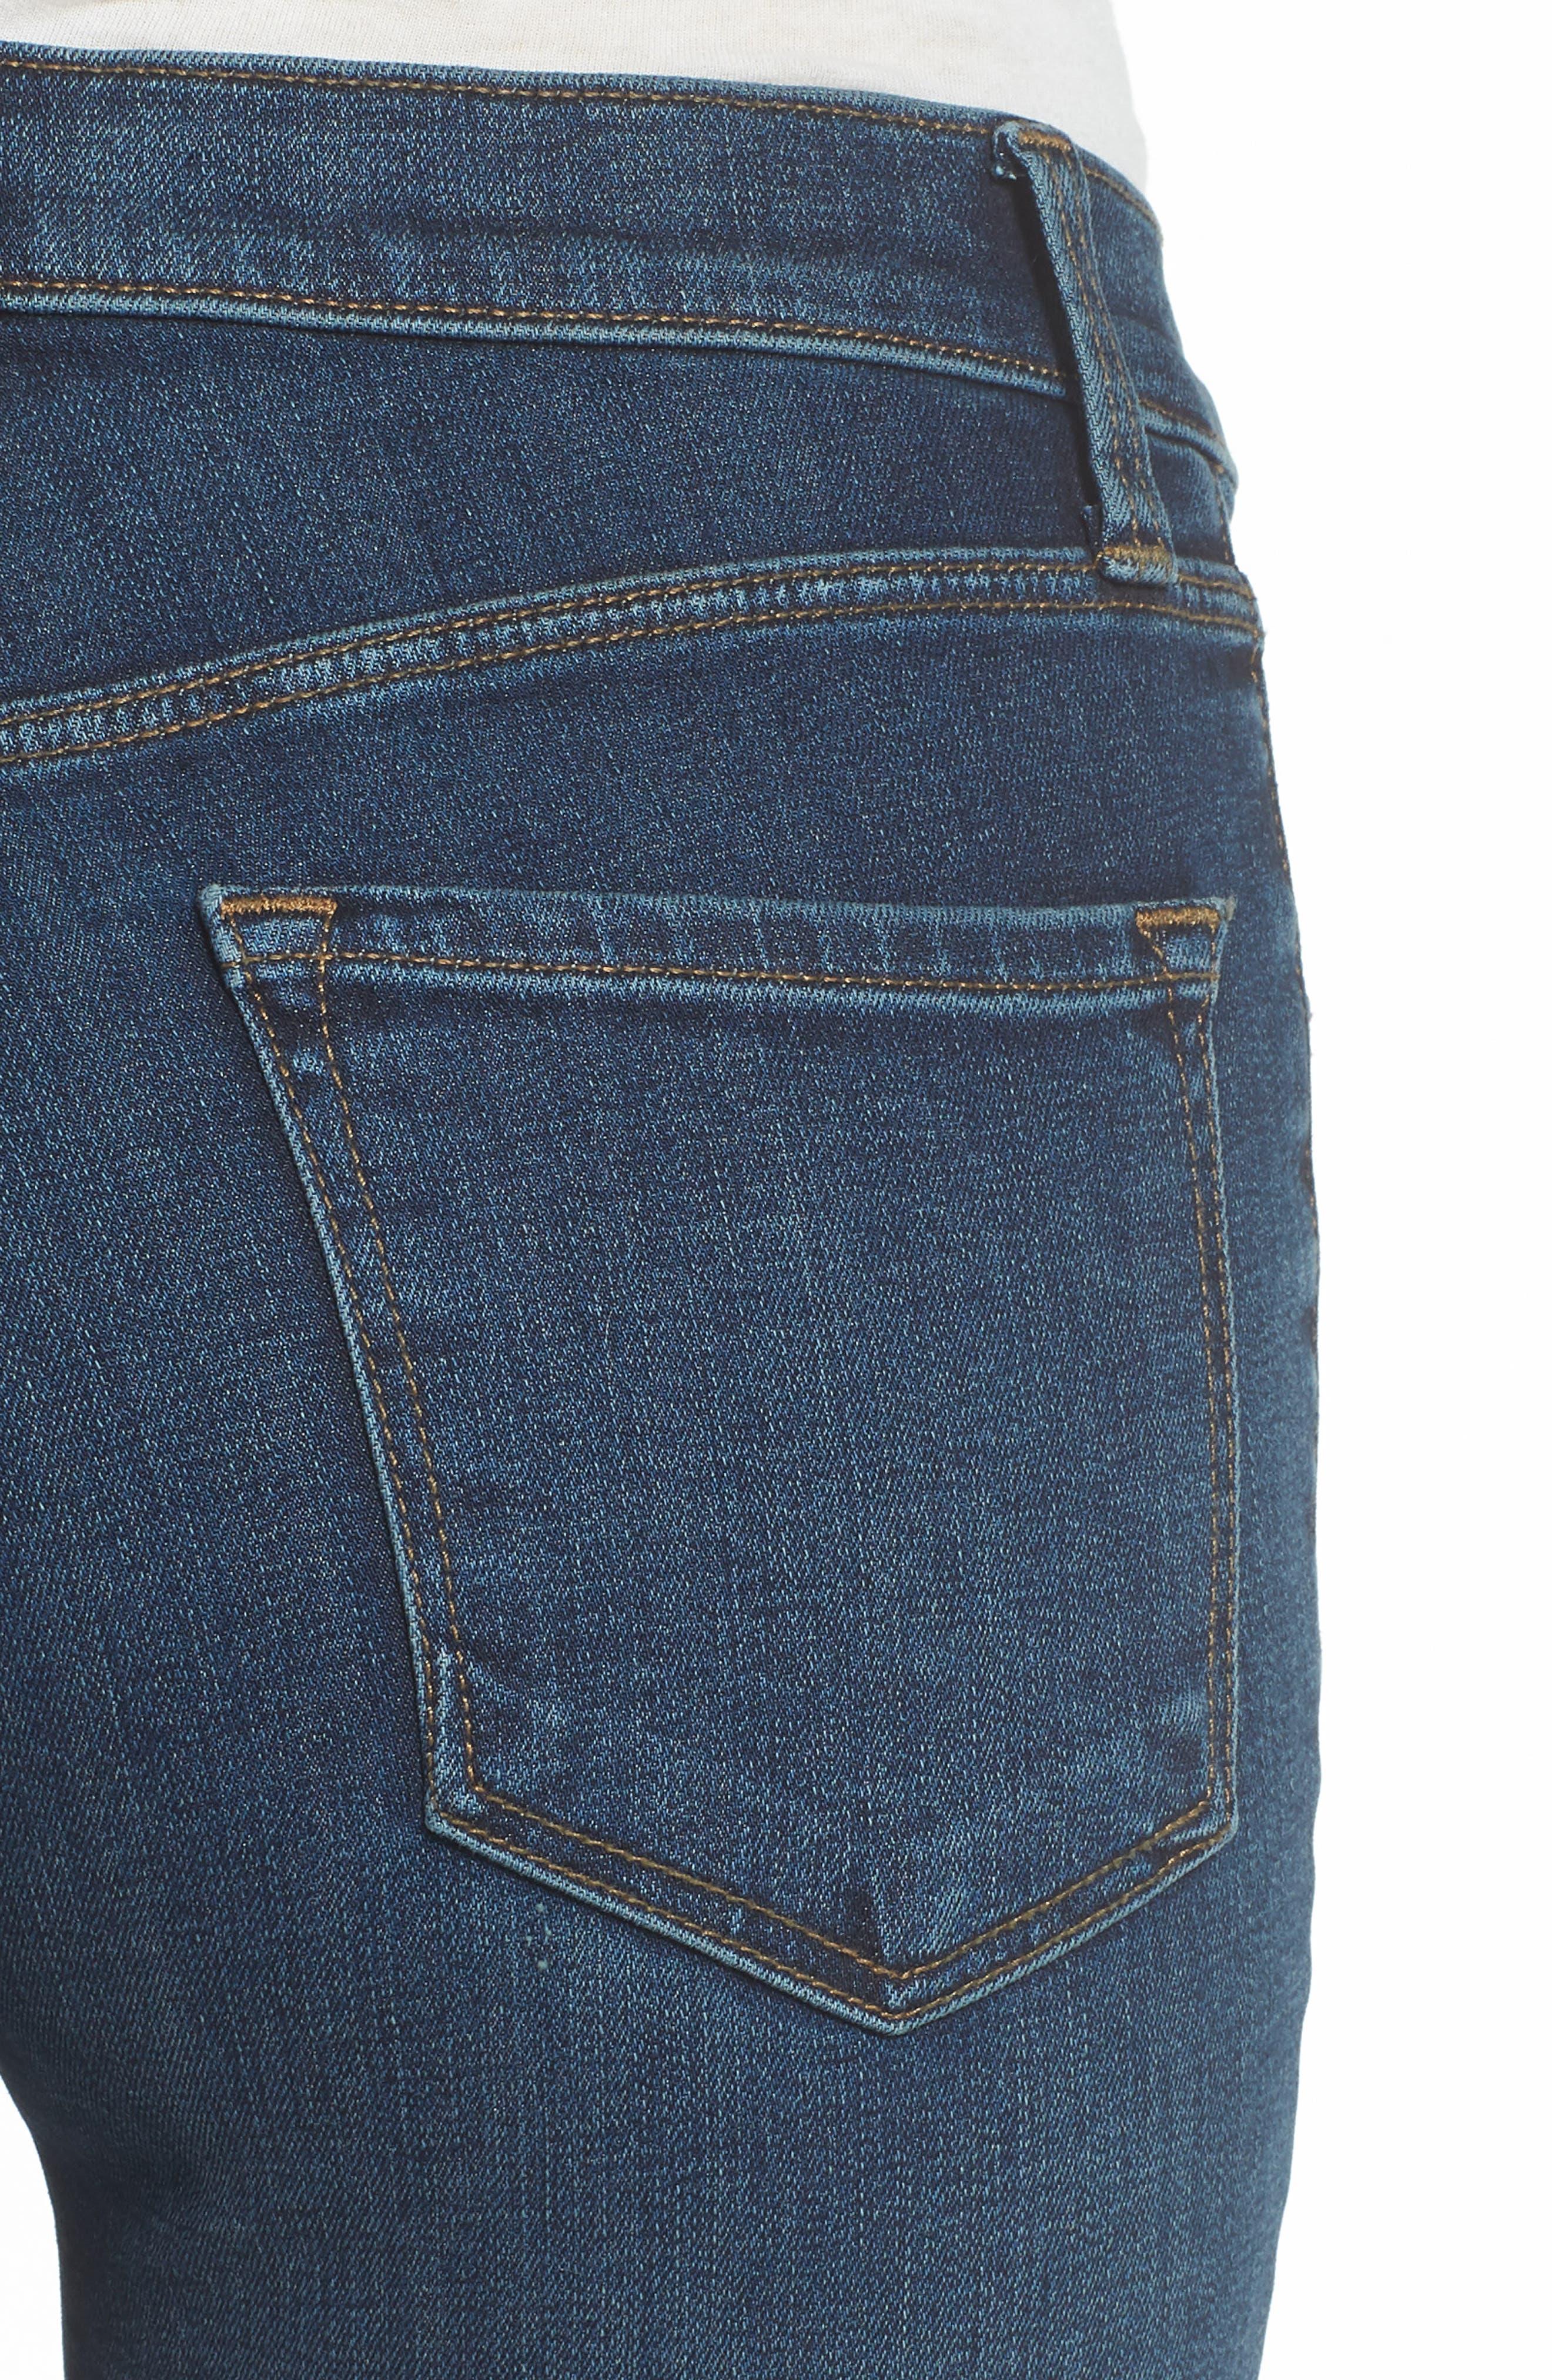 Maria High Waist Skinny Jeans,                             Alternate thumbnail 4, color,                             REVIVAL